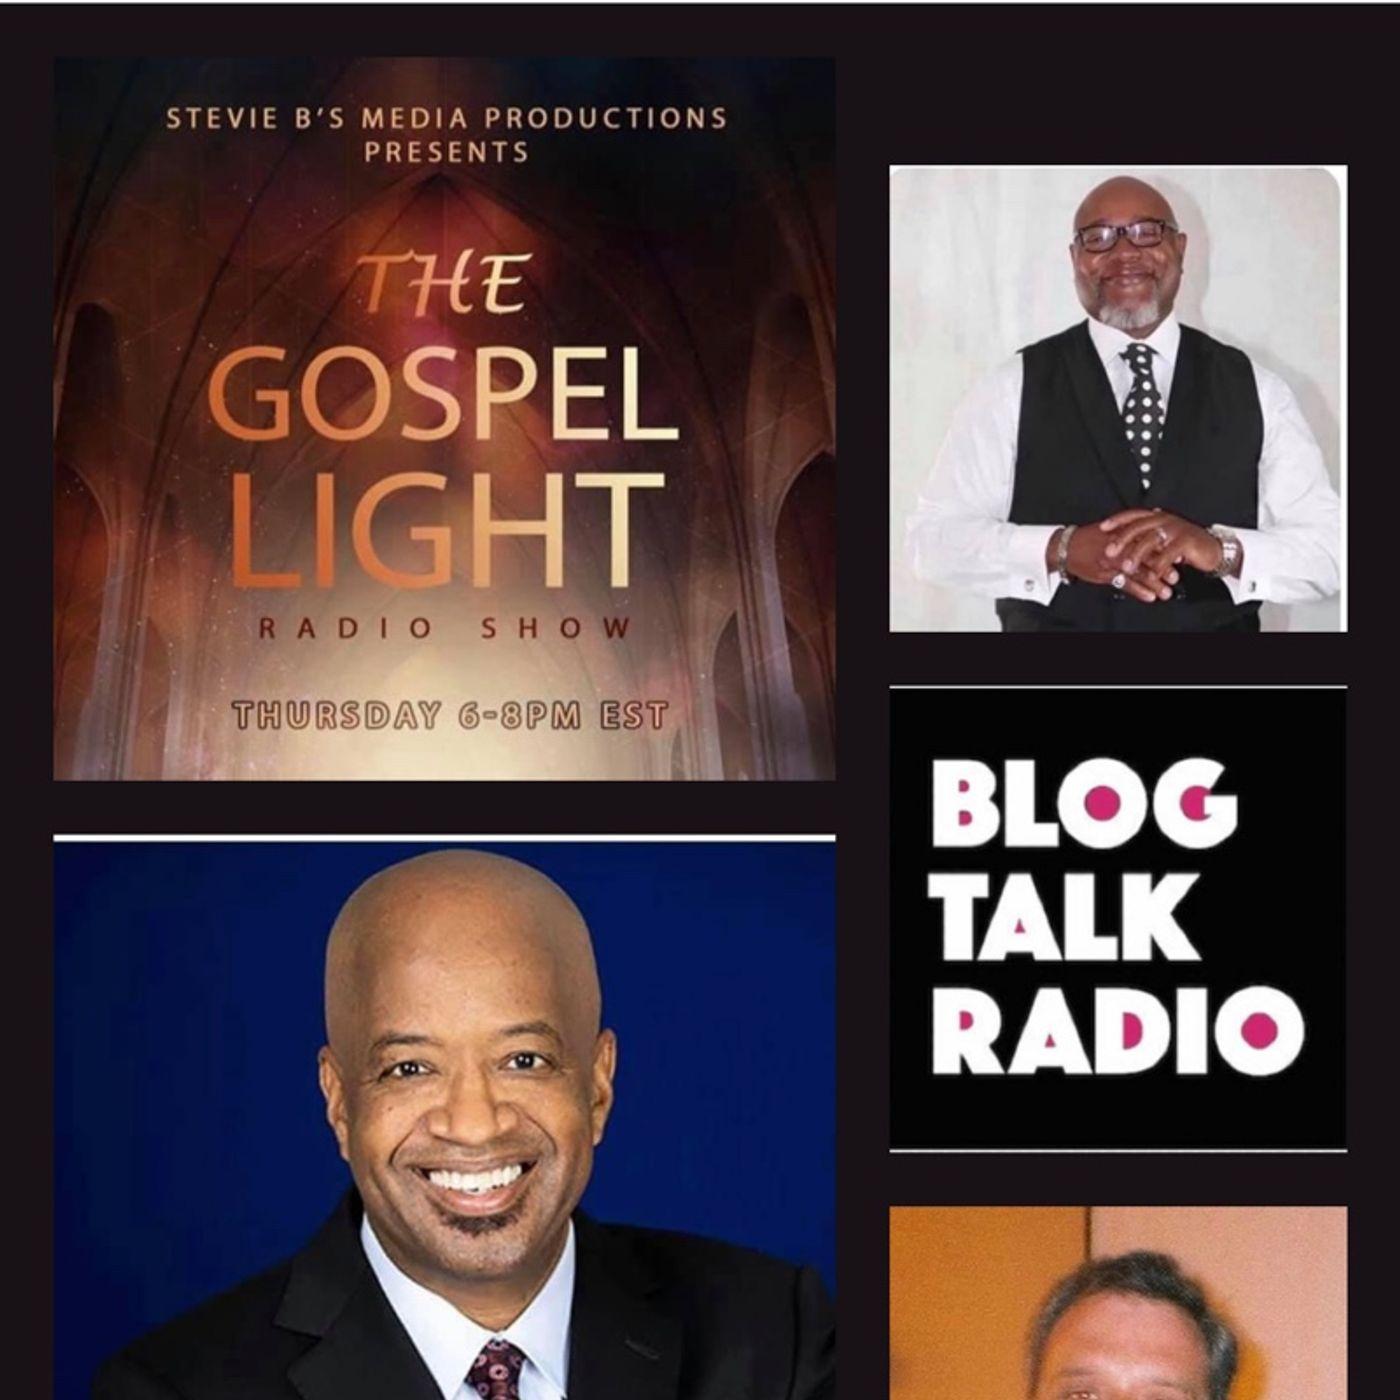 The Gospel Light Radio Show (Episode 238)